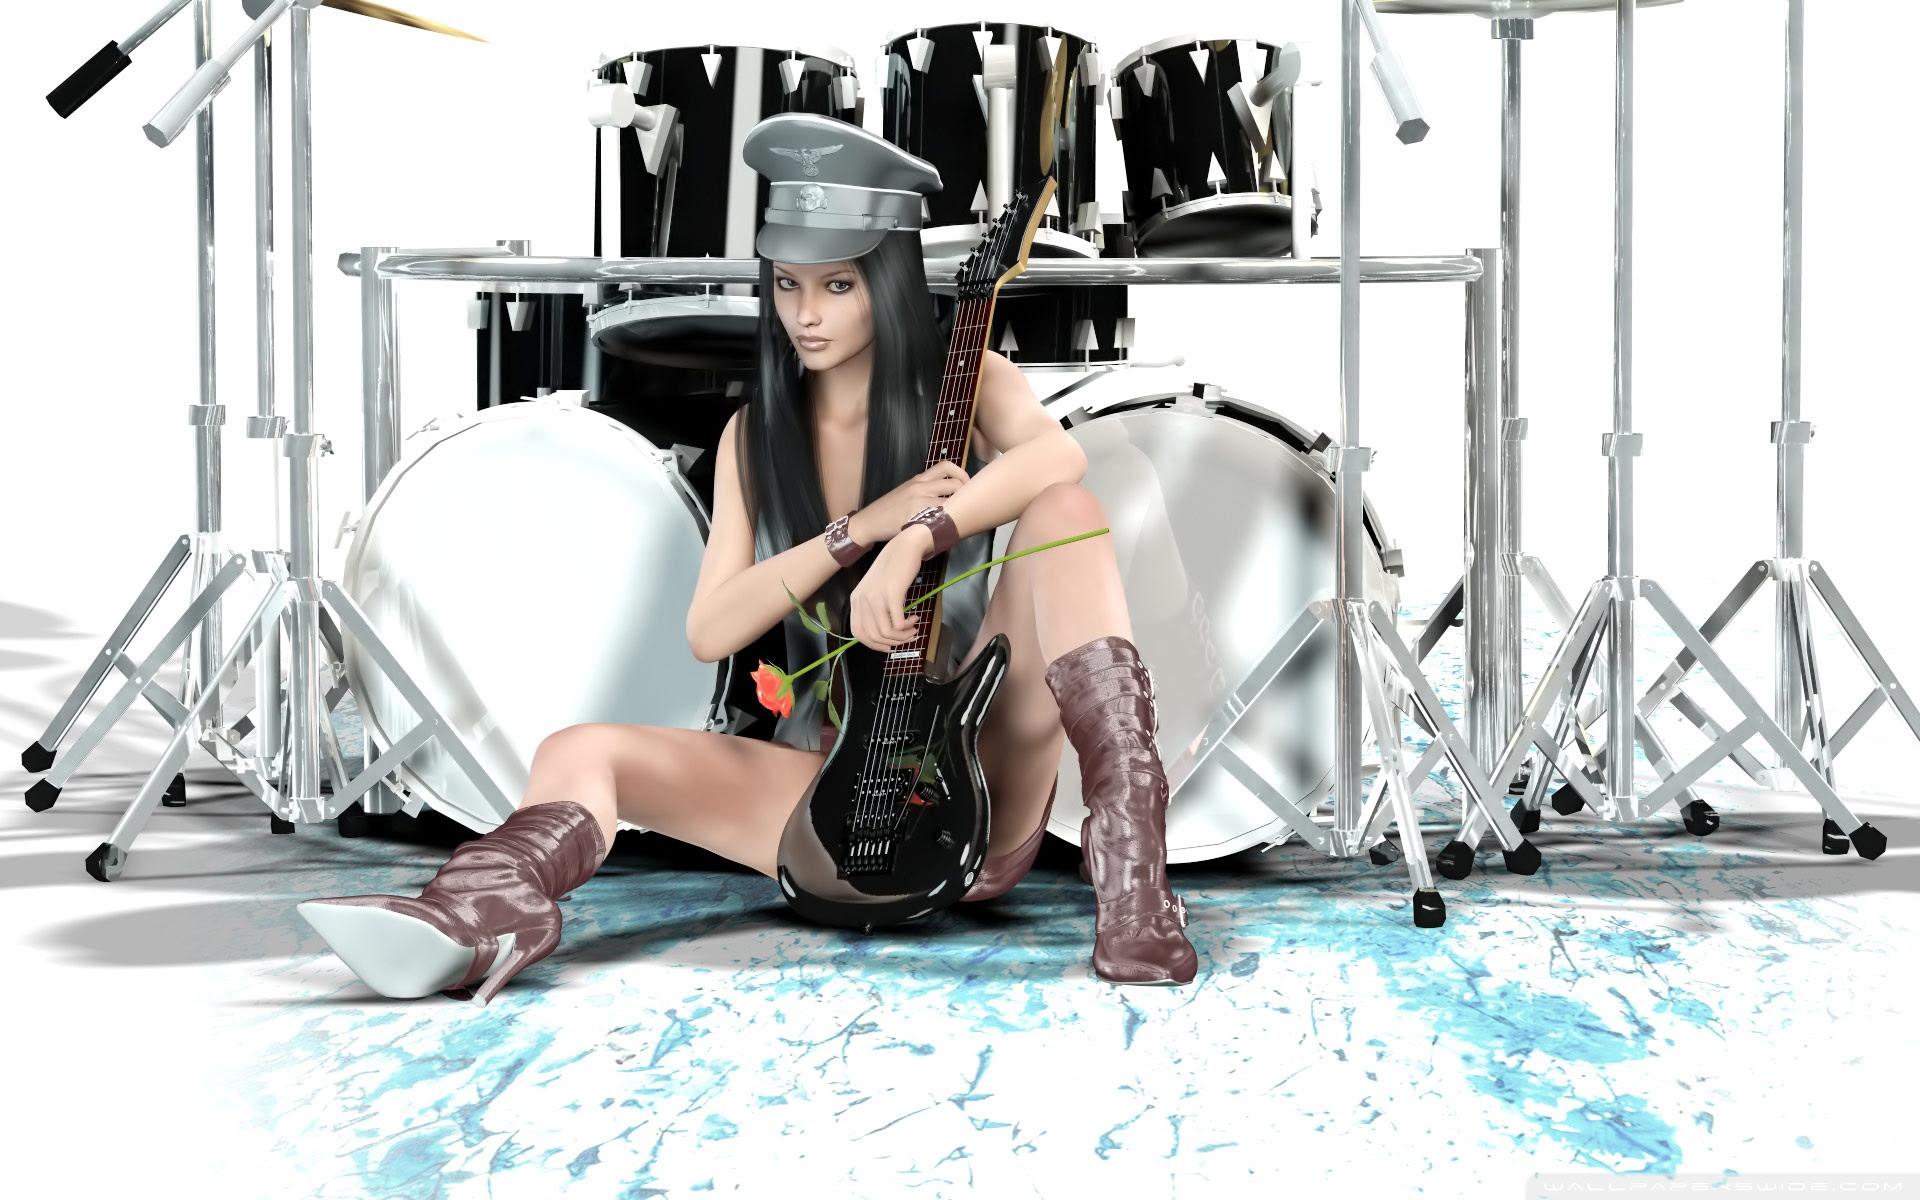 Sexy Guitarist Ultra Hd Desktop Background Wallpaper For 4k Uhd Tv